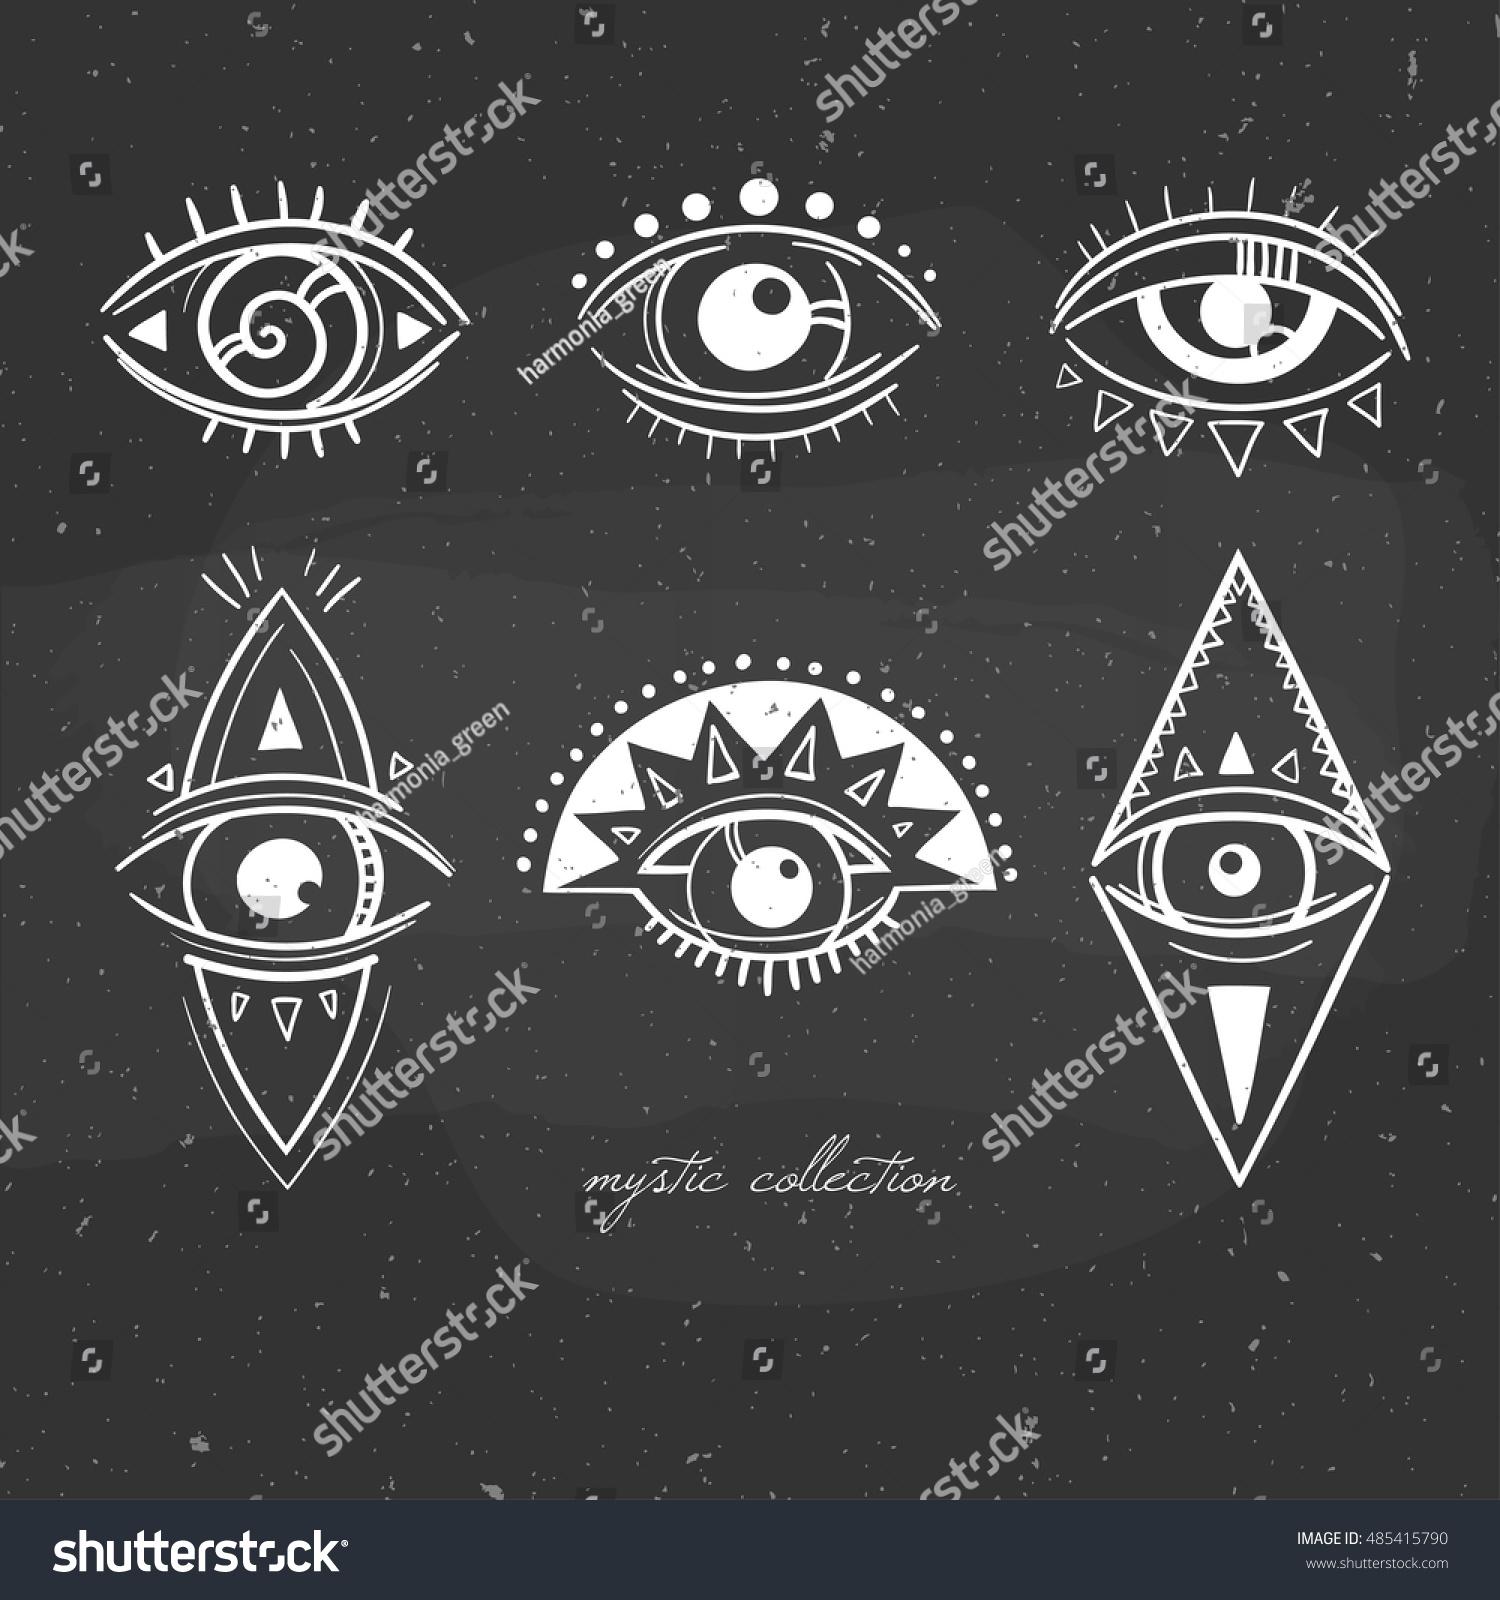 Black White Illustration Mystical Signs Eyes Stock Vector Royalty